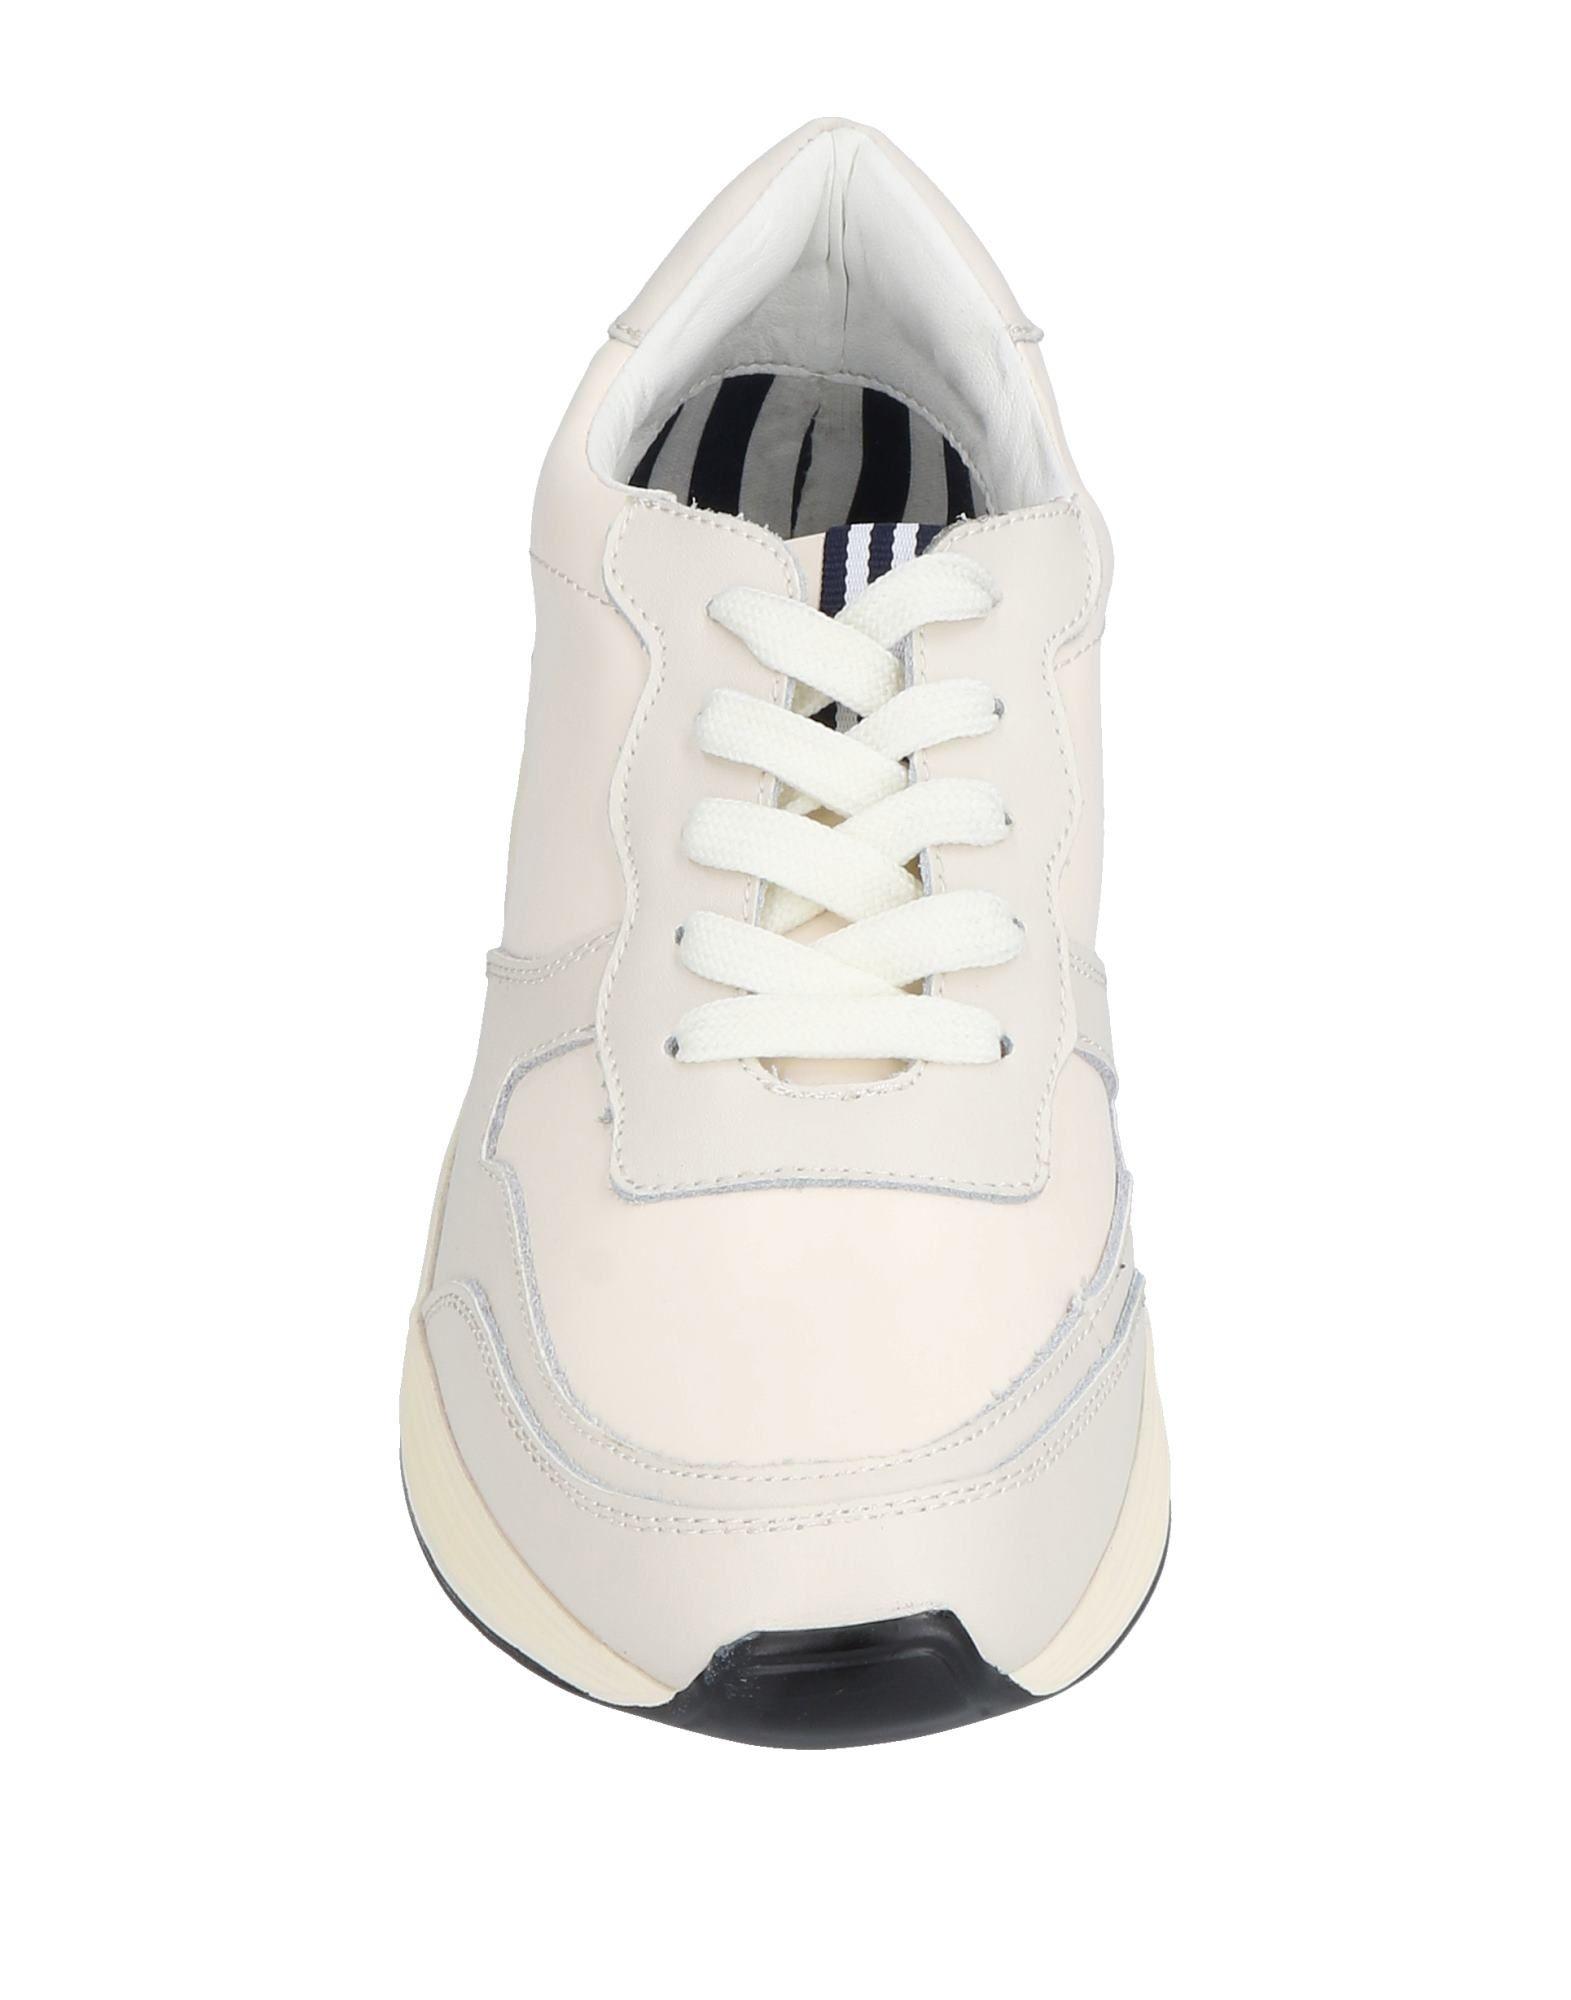 Marina Damen Yachting Sneakers Damen Marina  11505032NG Gute Qualität beliebte Schuhe b74634